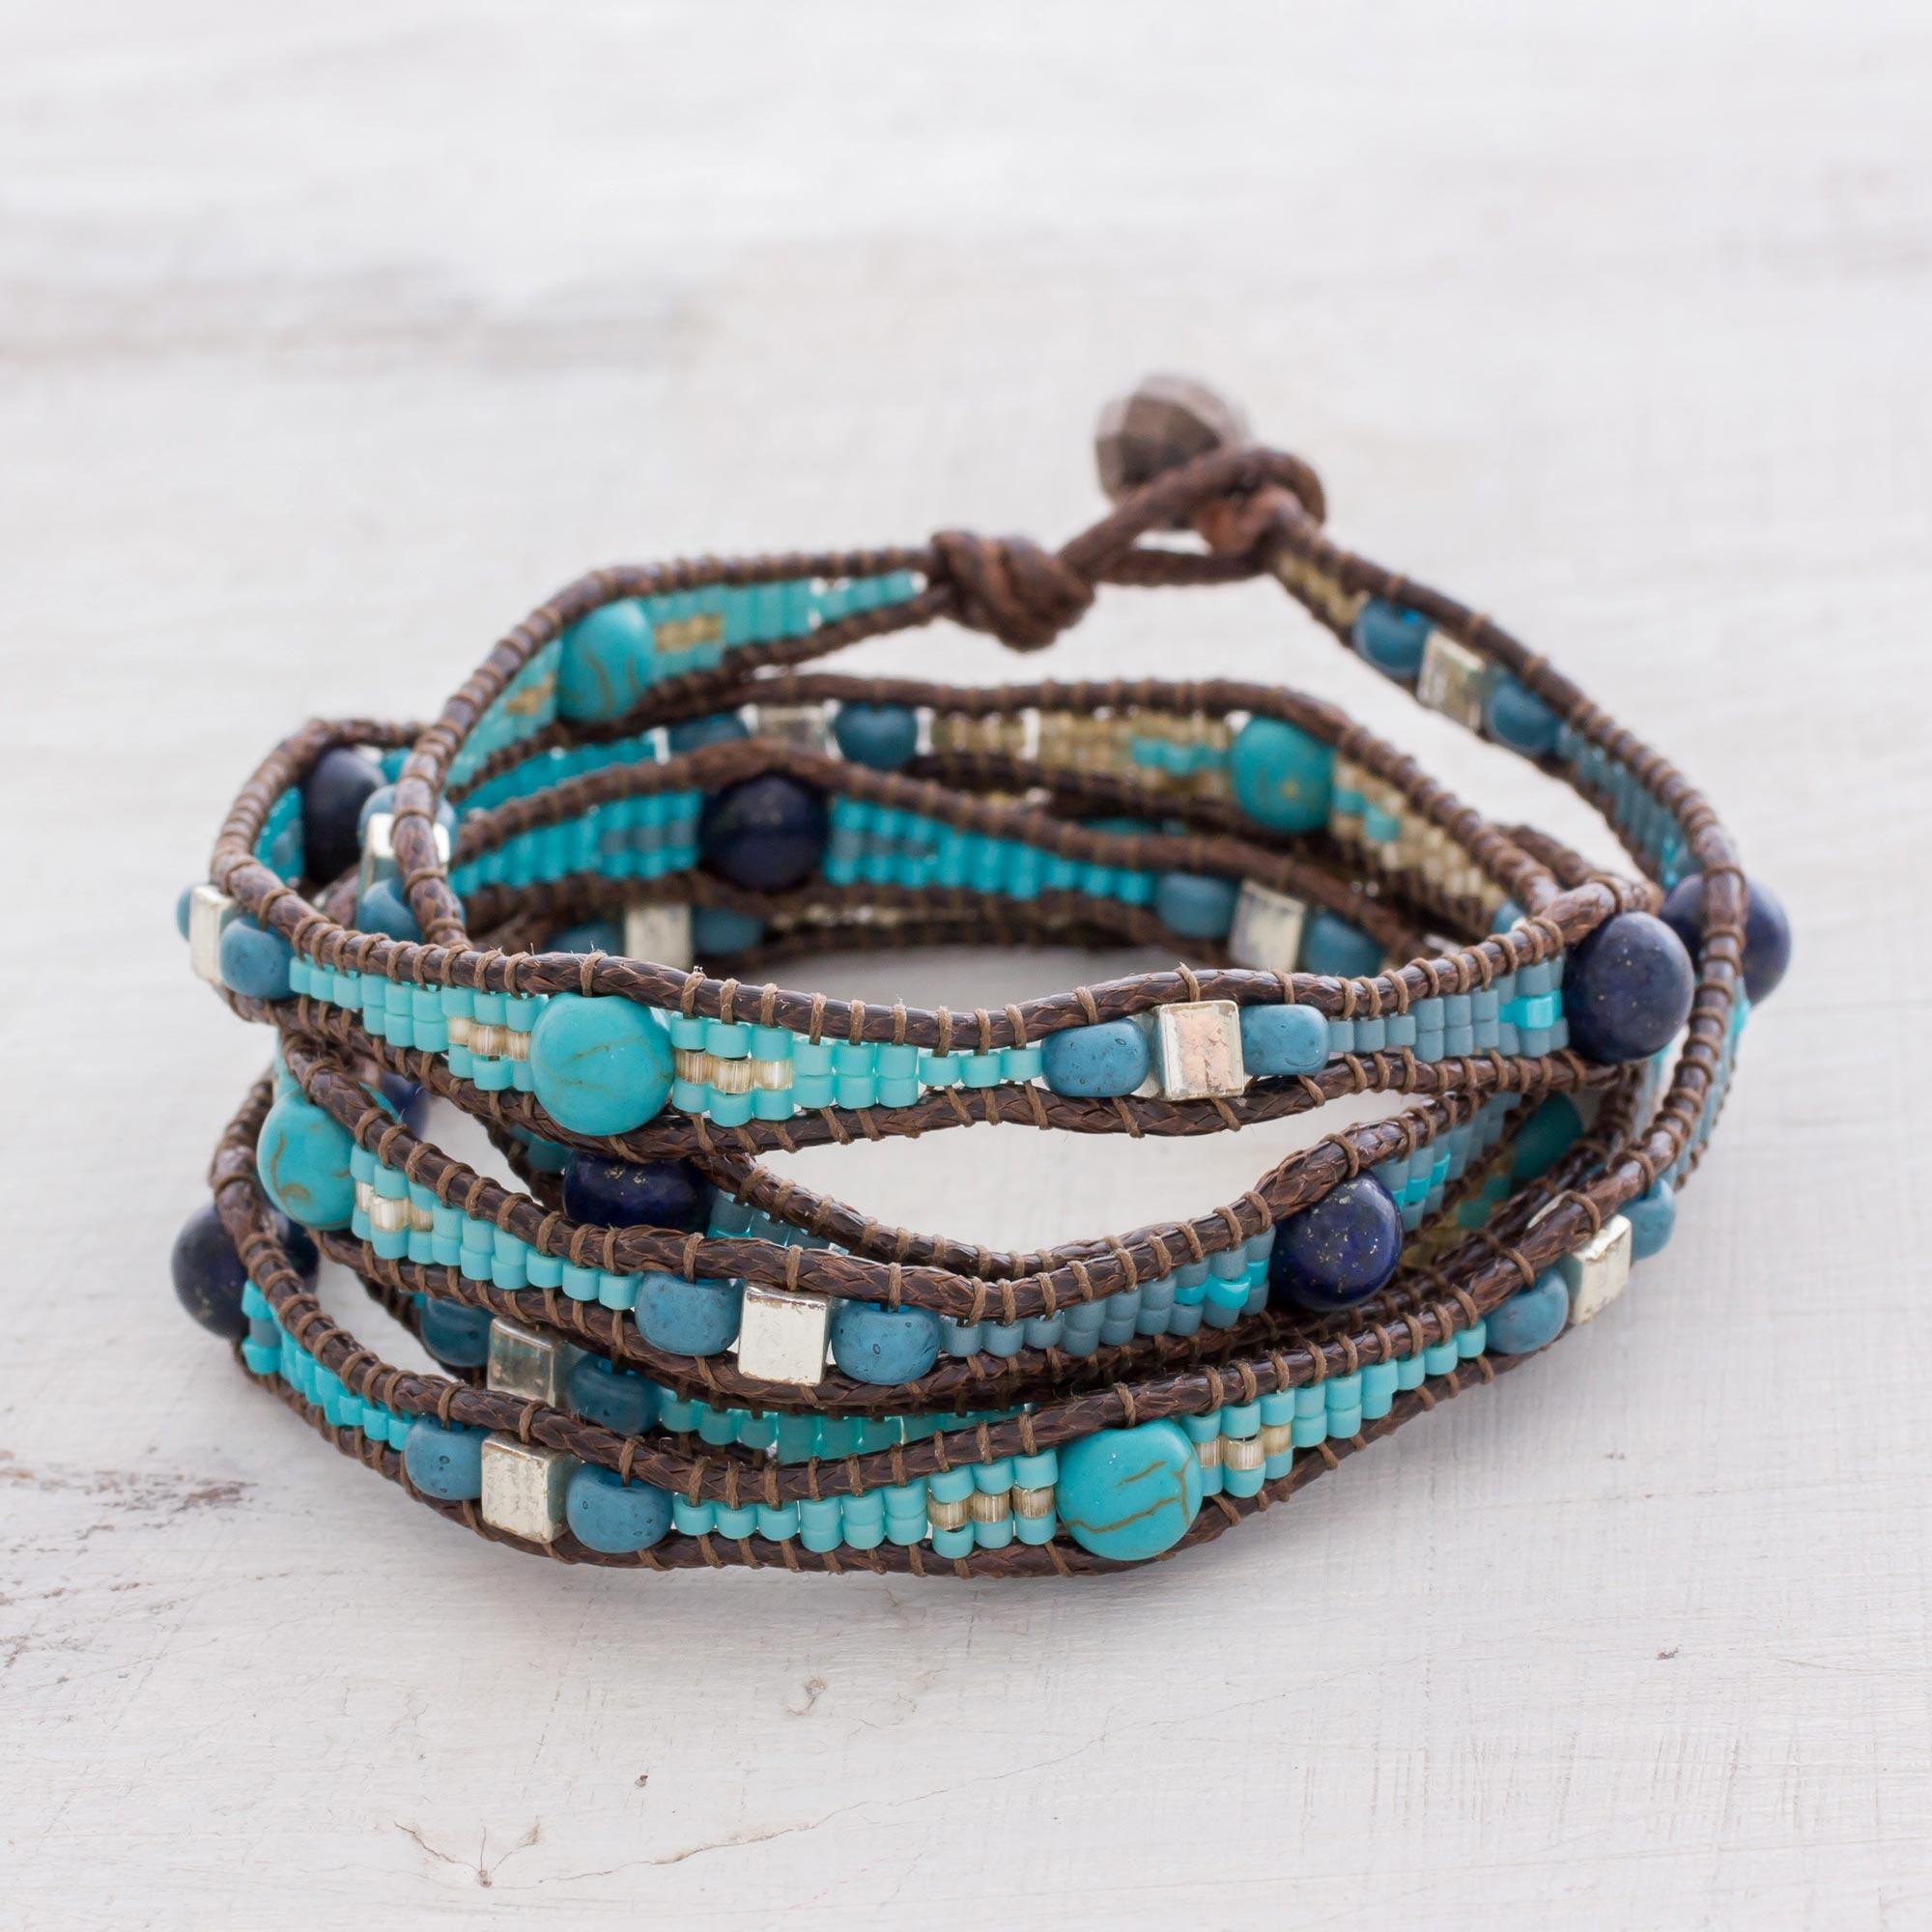 Lapis Lazuli Beaded Wrap Bracelet From Guatemala Stones Of Destiny